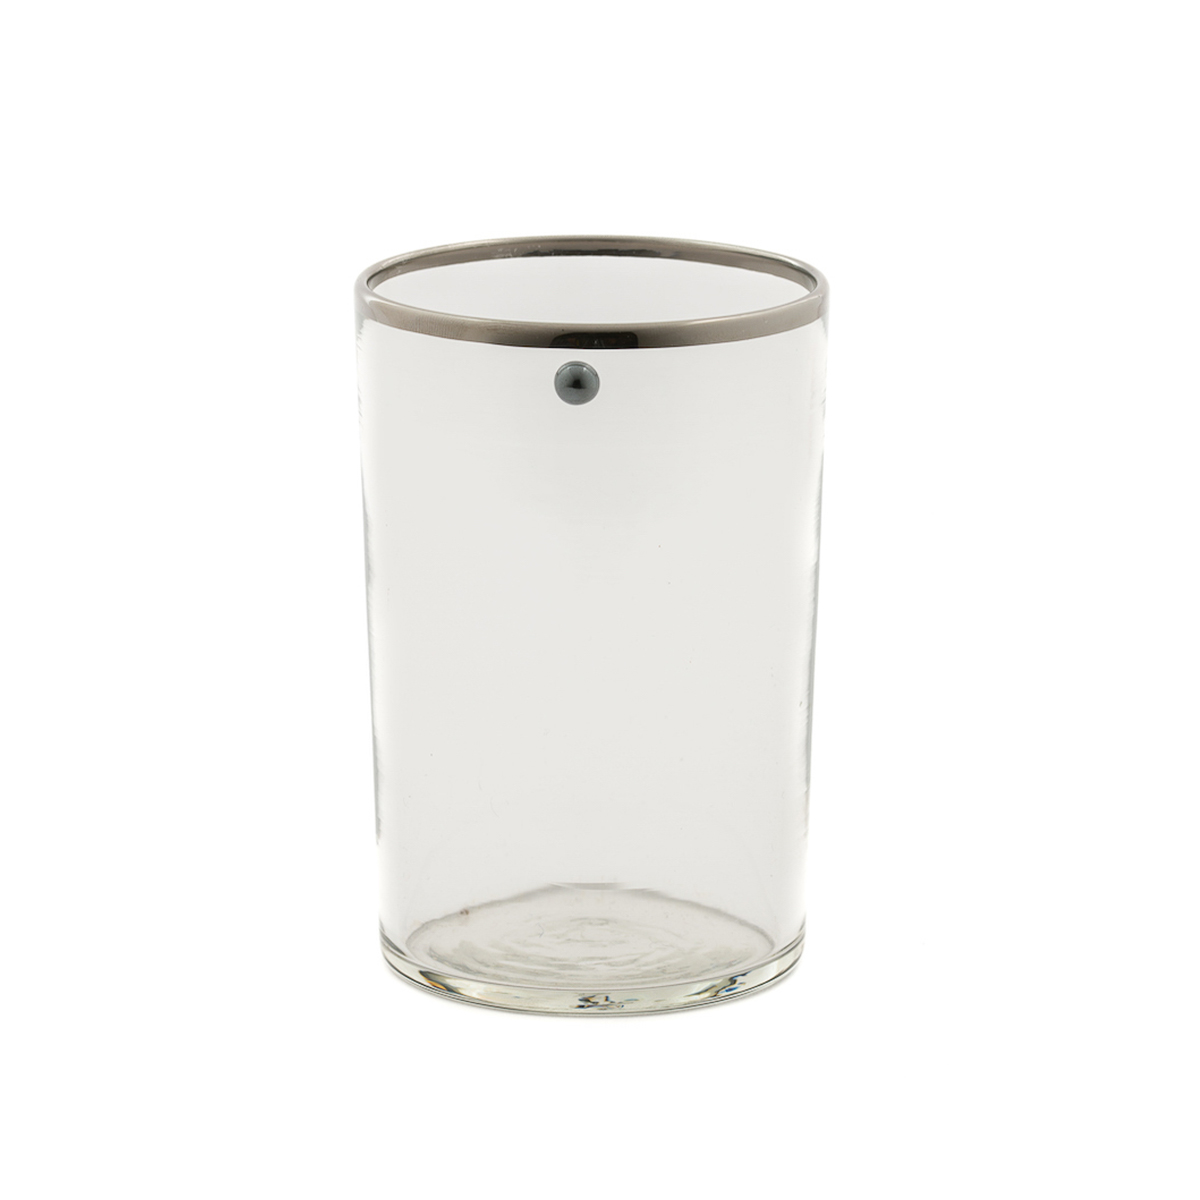 isabelle_water_glass_designer_crystal_platinum_murano_handmade